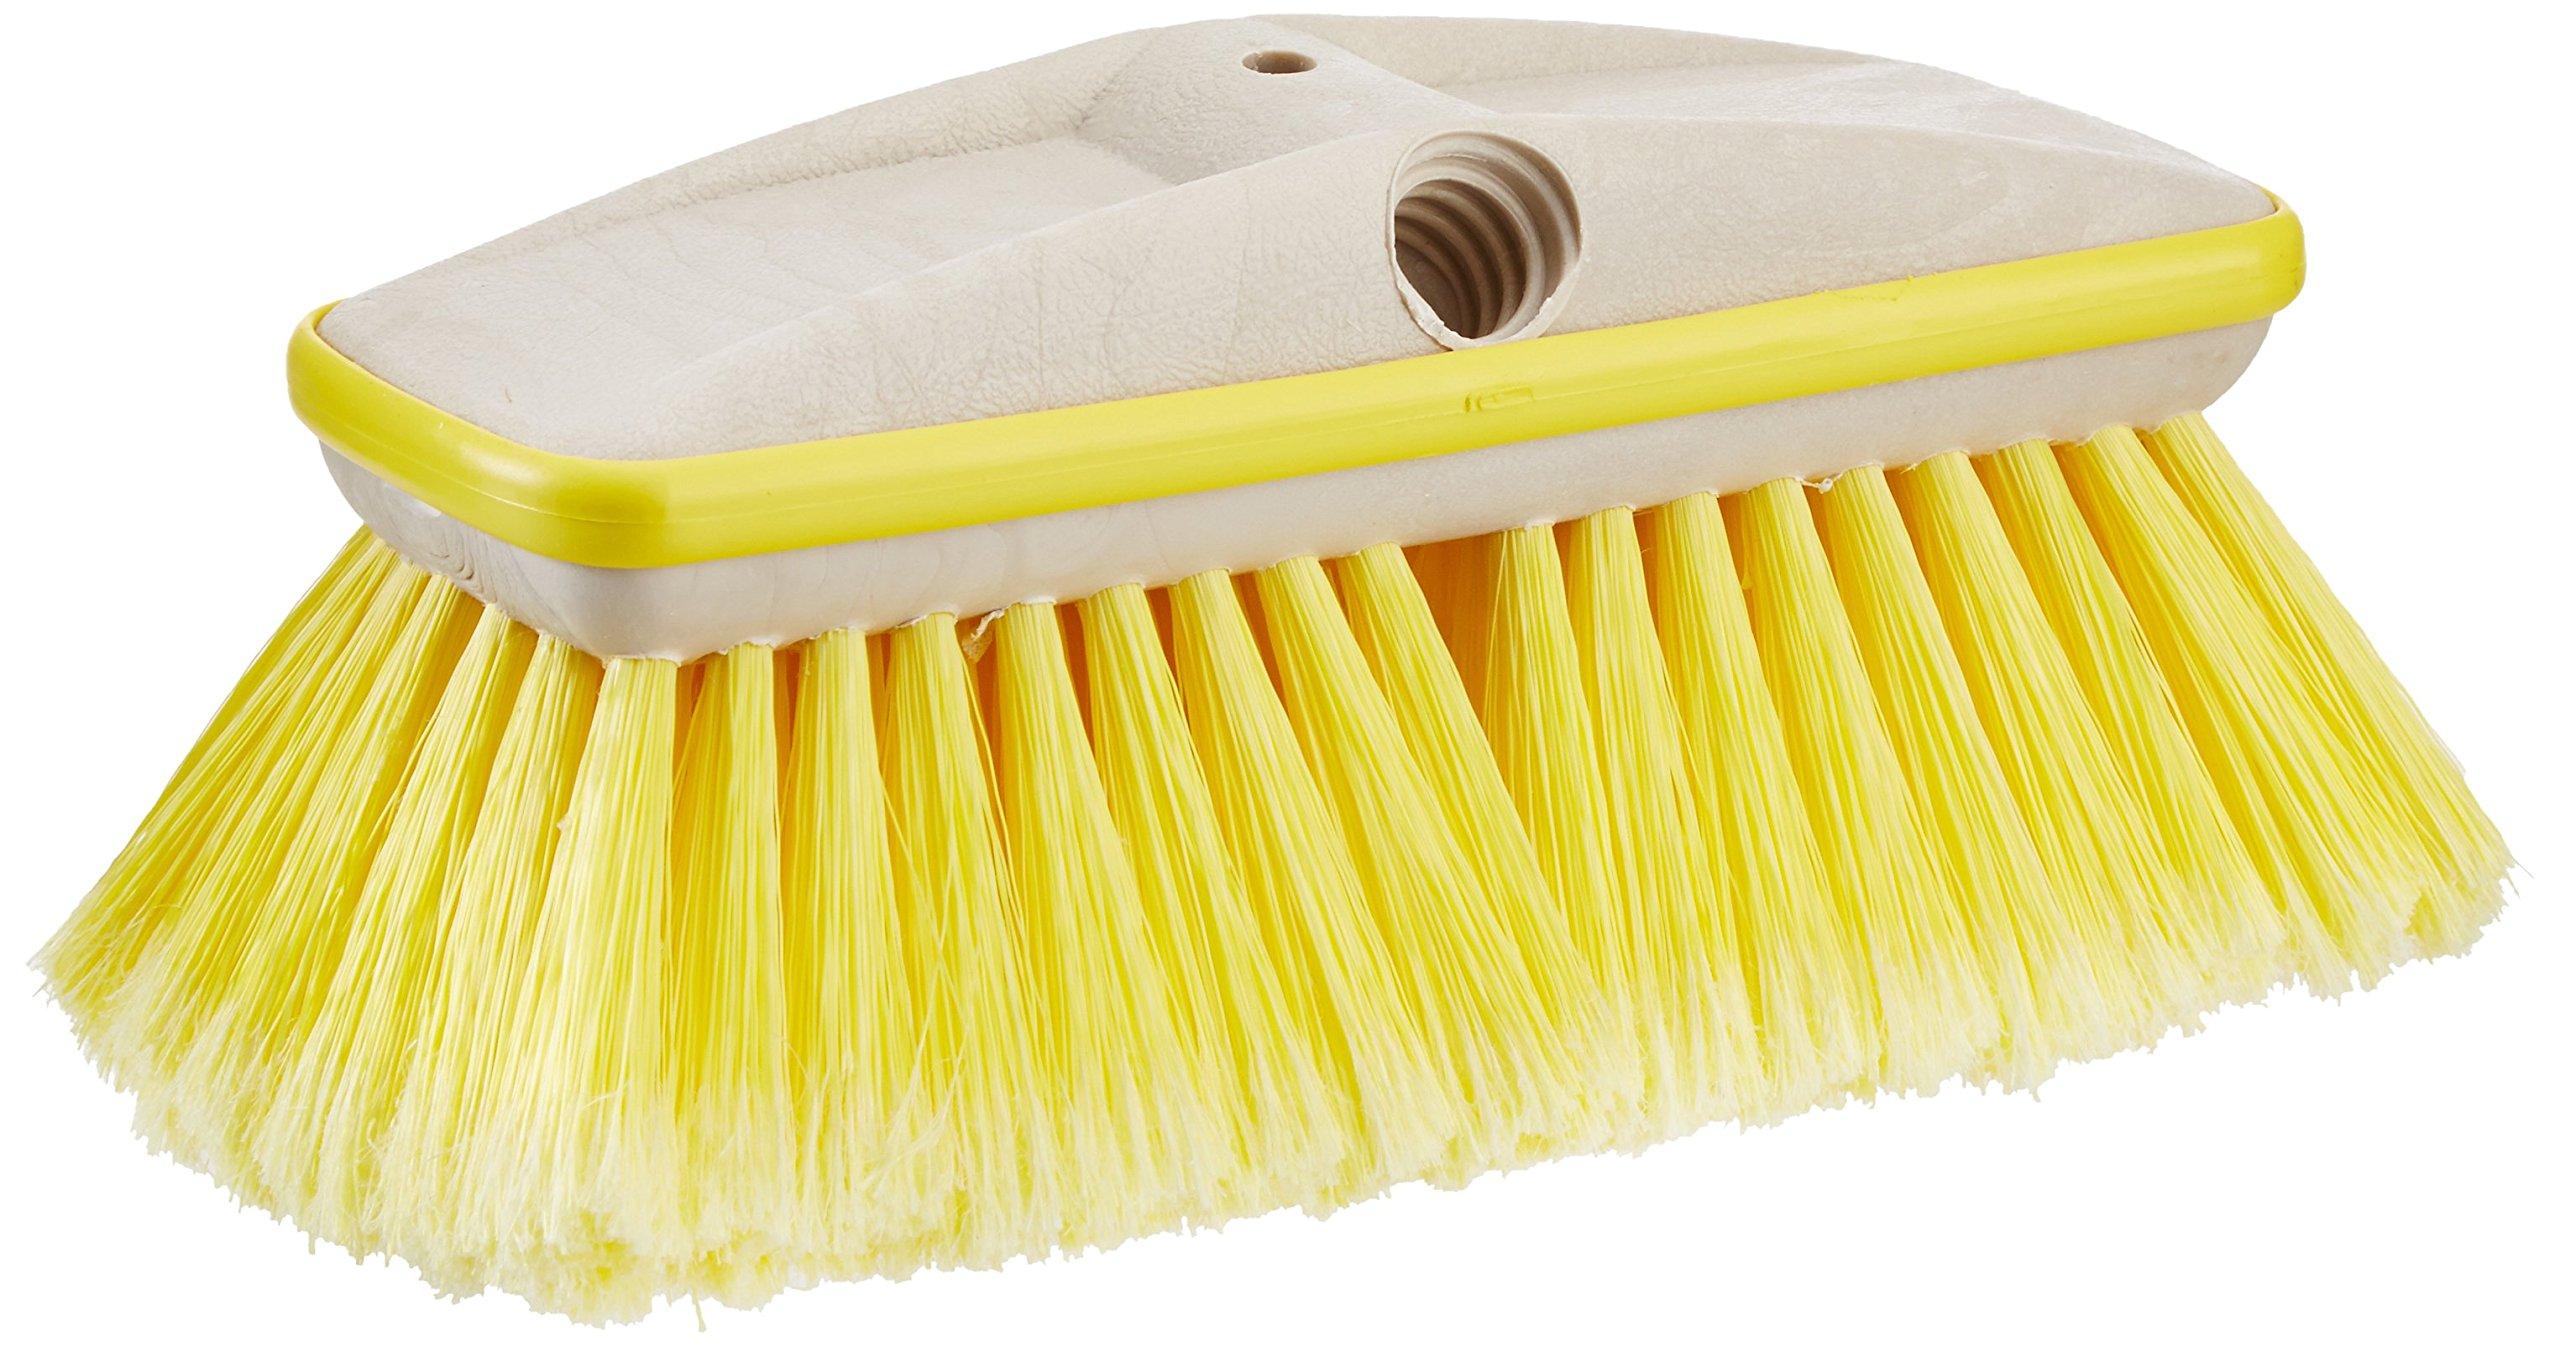 Star brite Soft Premium Wash Brush by Star Brite (Image #4)